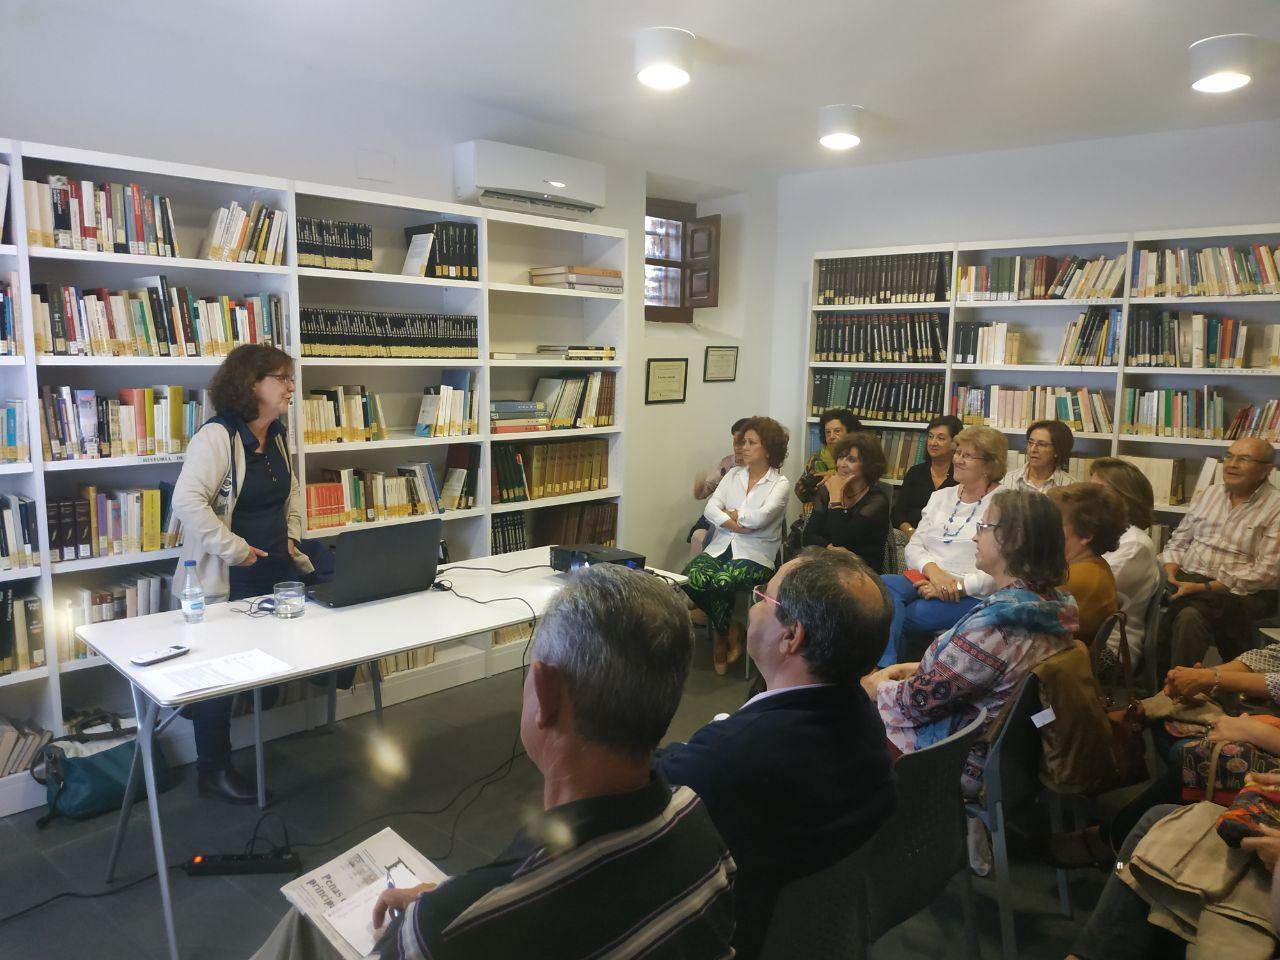 2019 Biblioteca Municipal Rafael Sánchez Ferlosio (Coria, Cáceres)